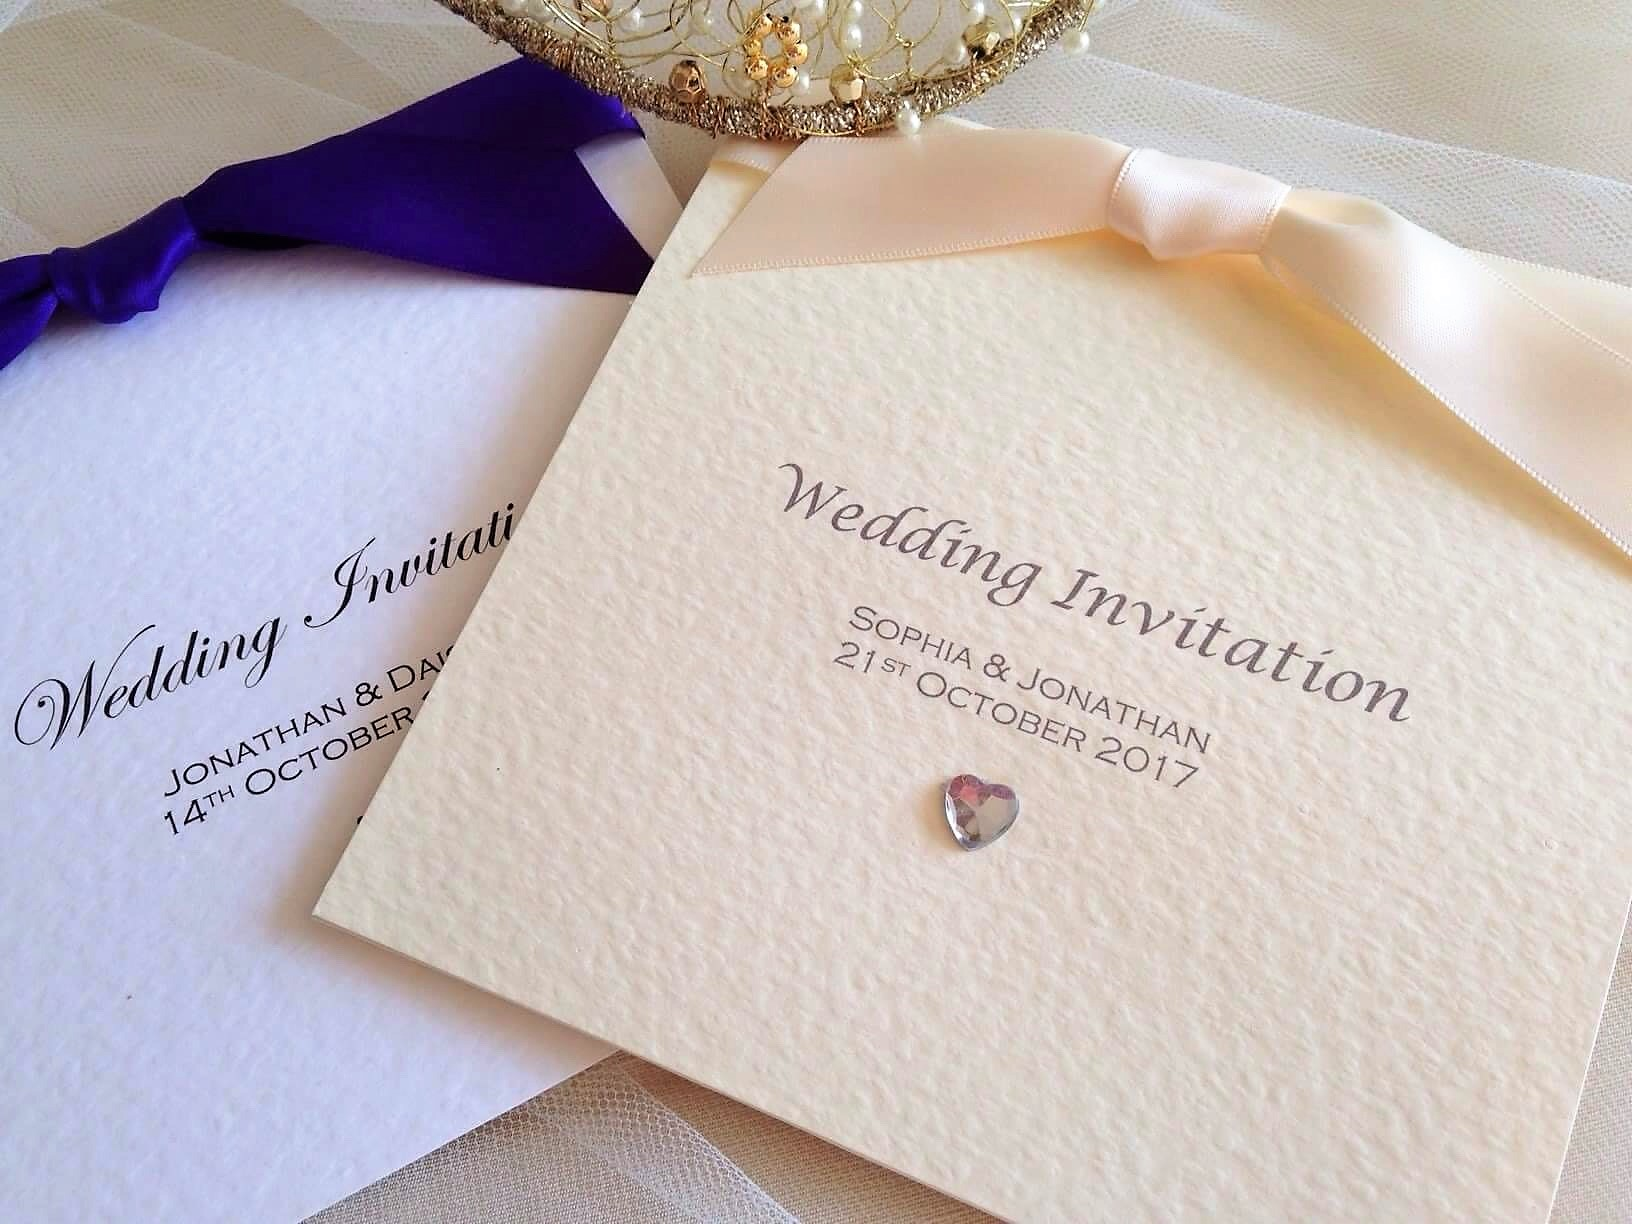 Wedding Invitation Uk: Pocketfold Wedding Invitations From £2.25